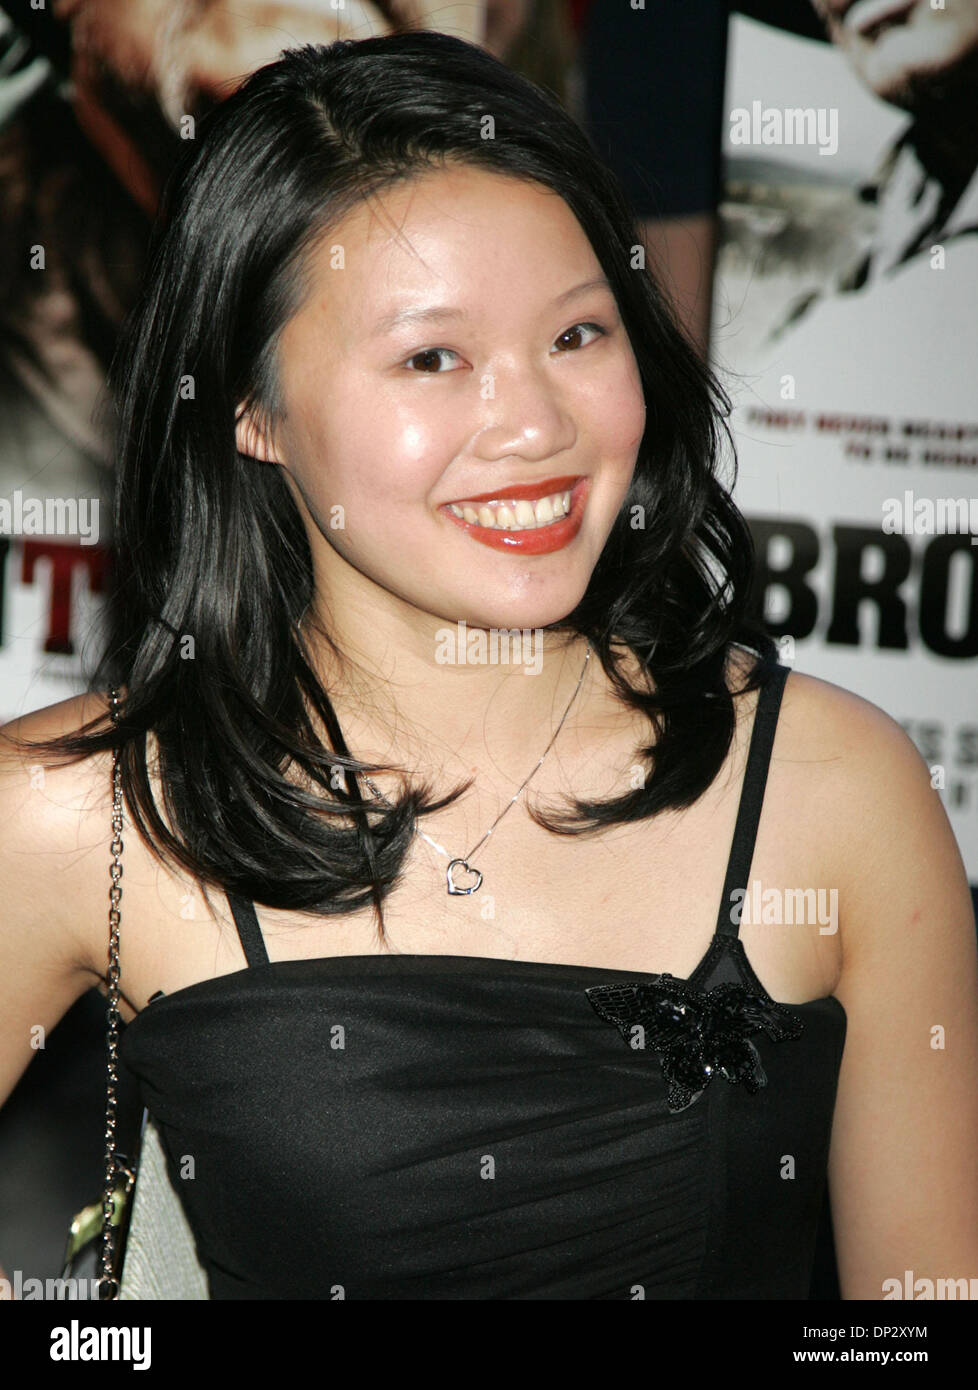 Caroline Chan Nude Photos 2